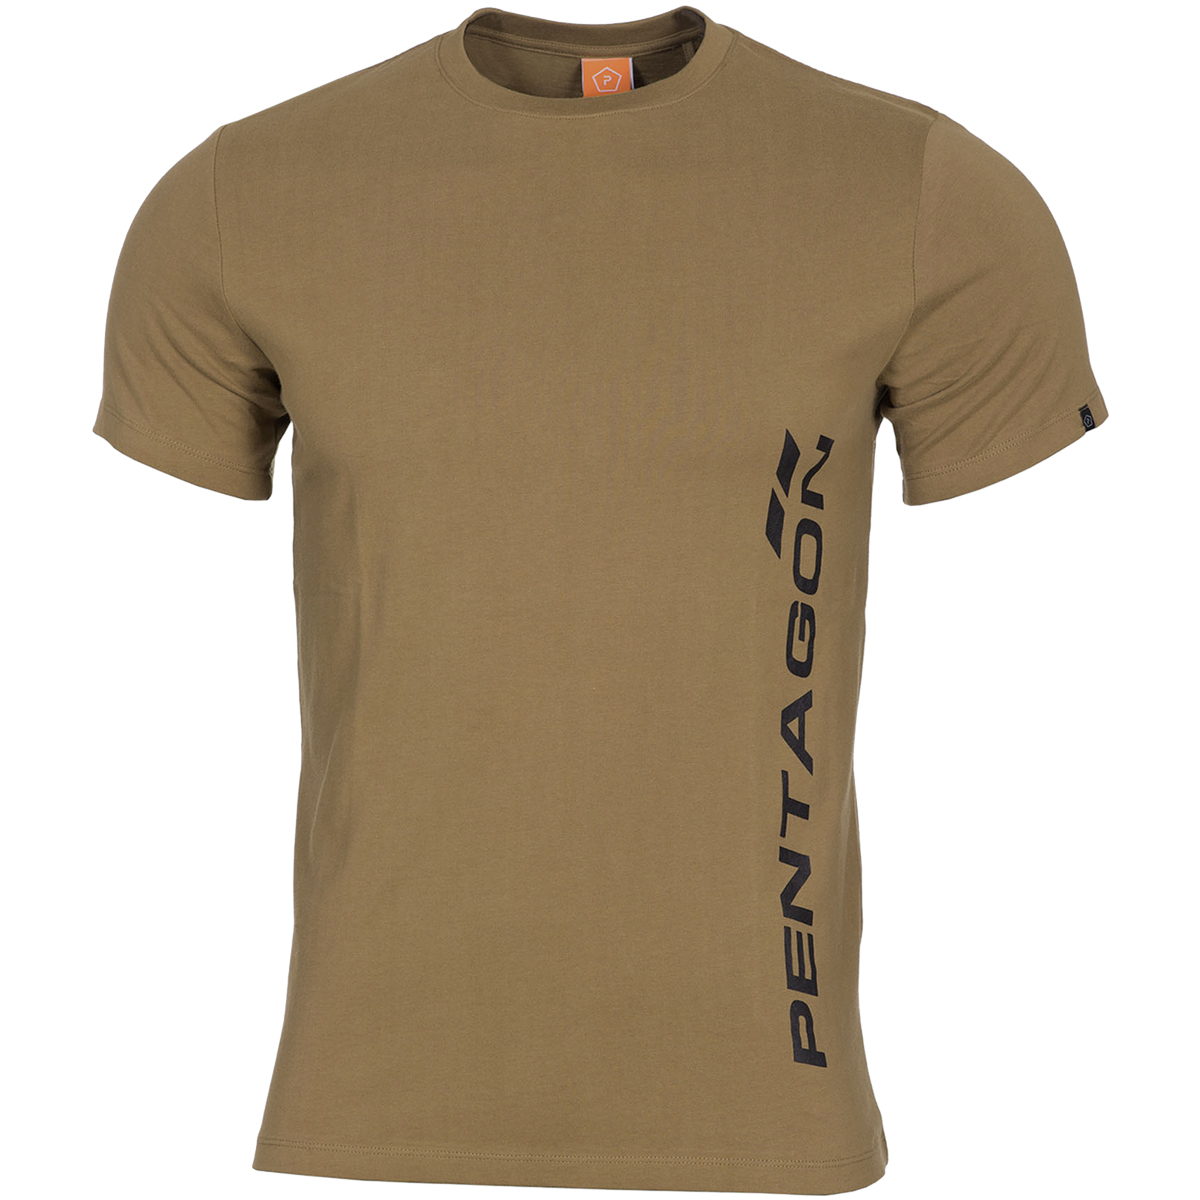 Pentagon ageron t shirt vertical logo gym workout top mens for Logo dress shirts no minimum